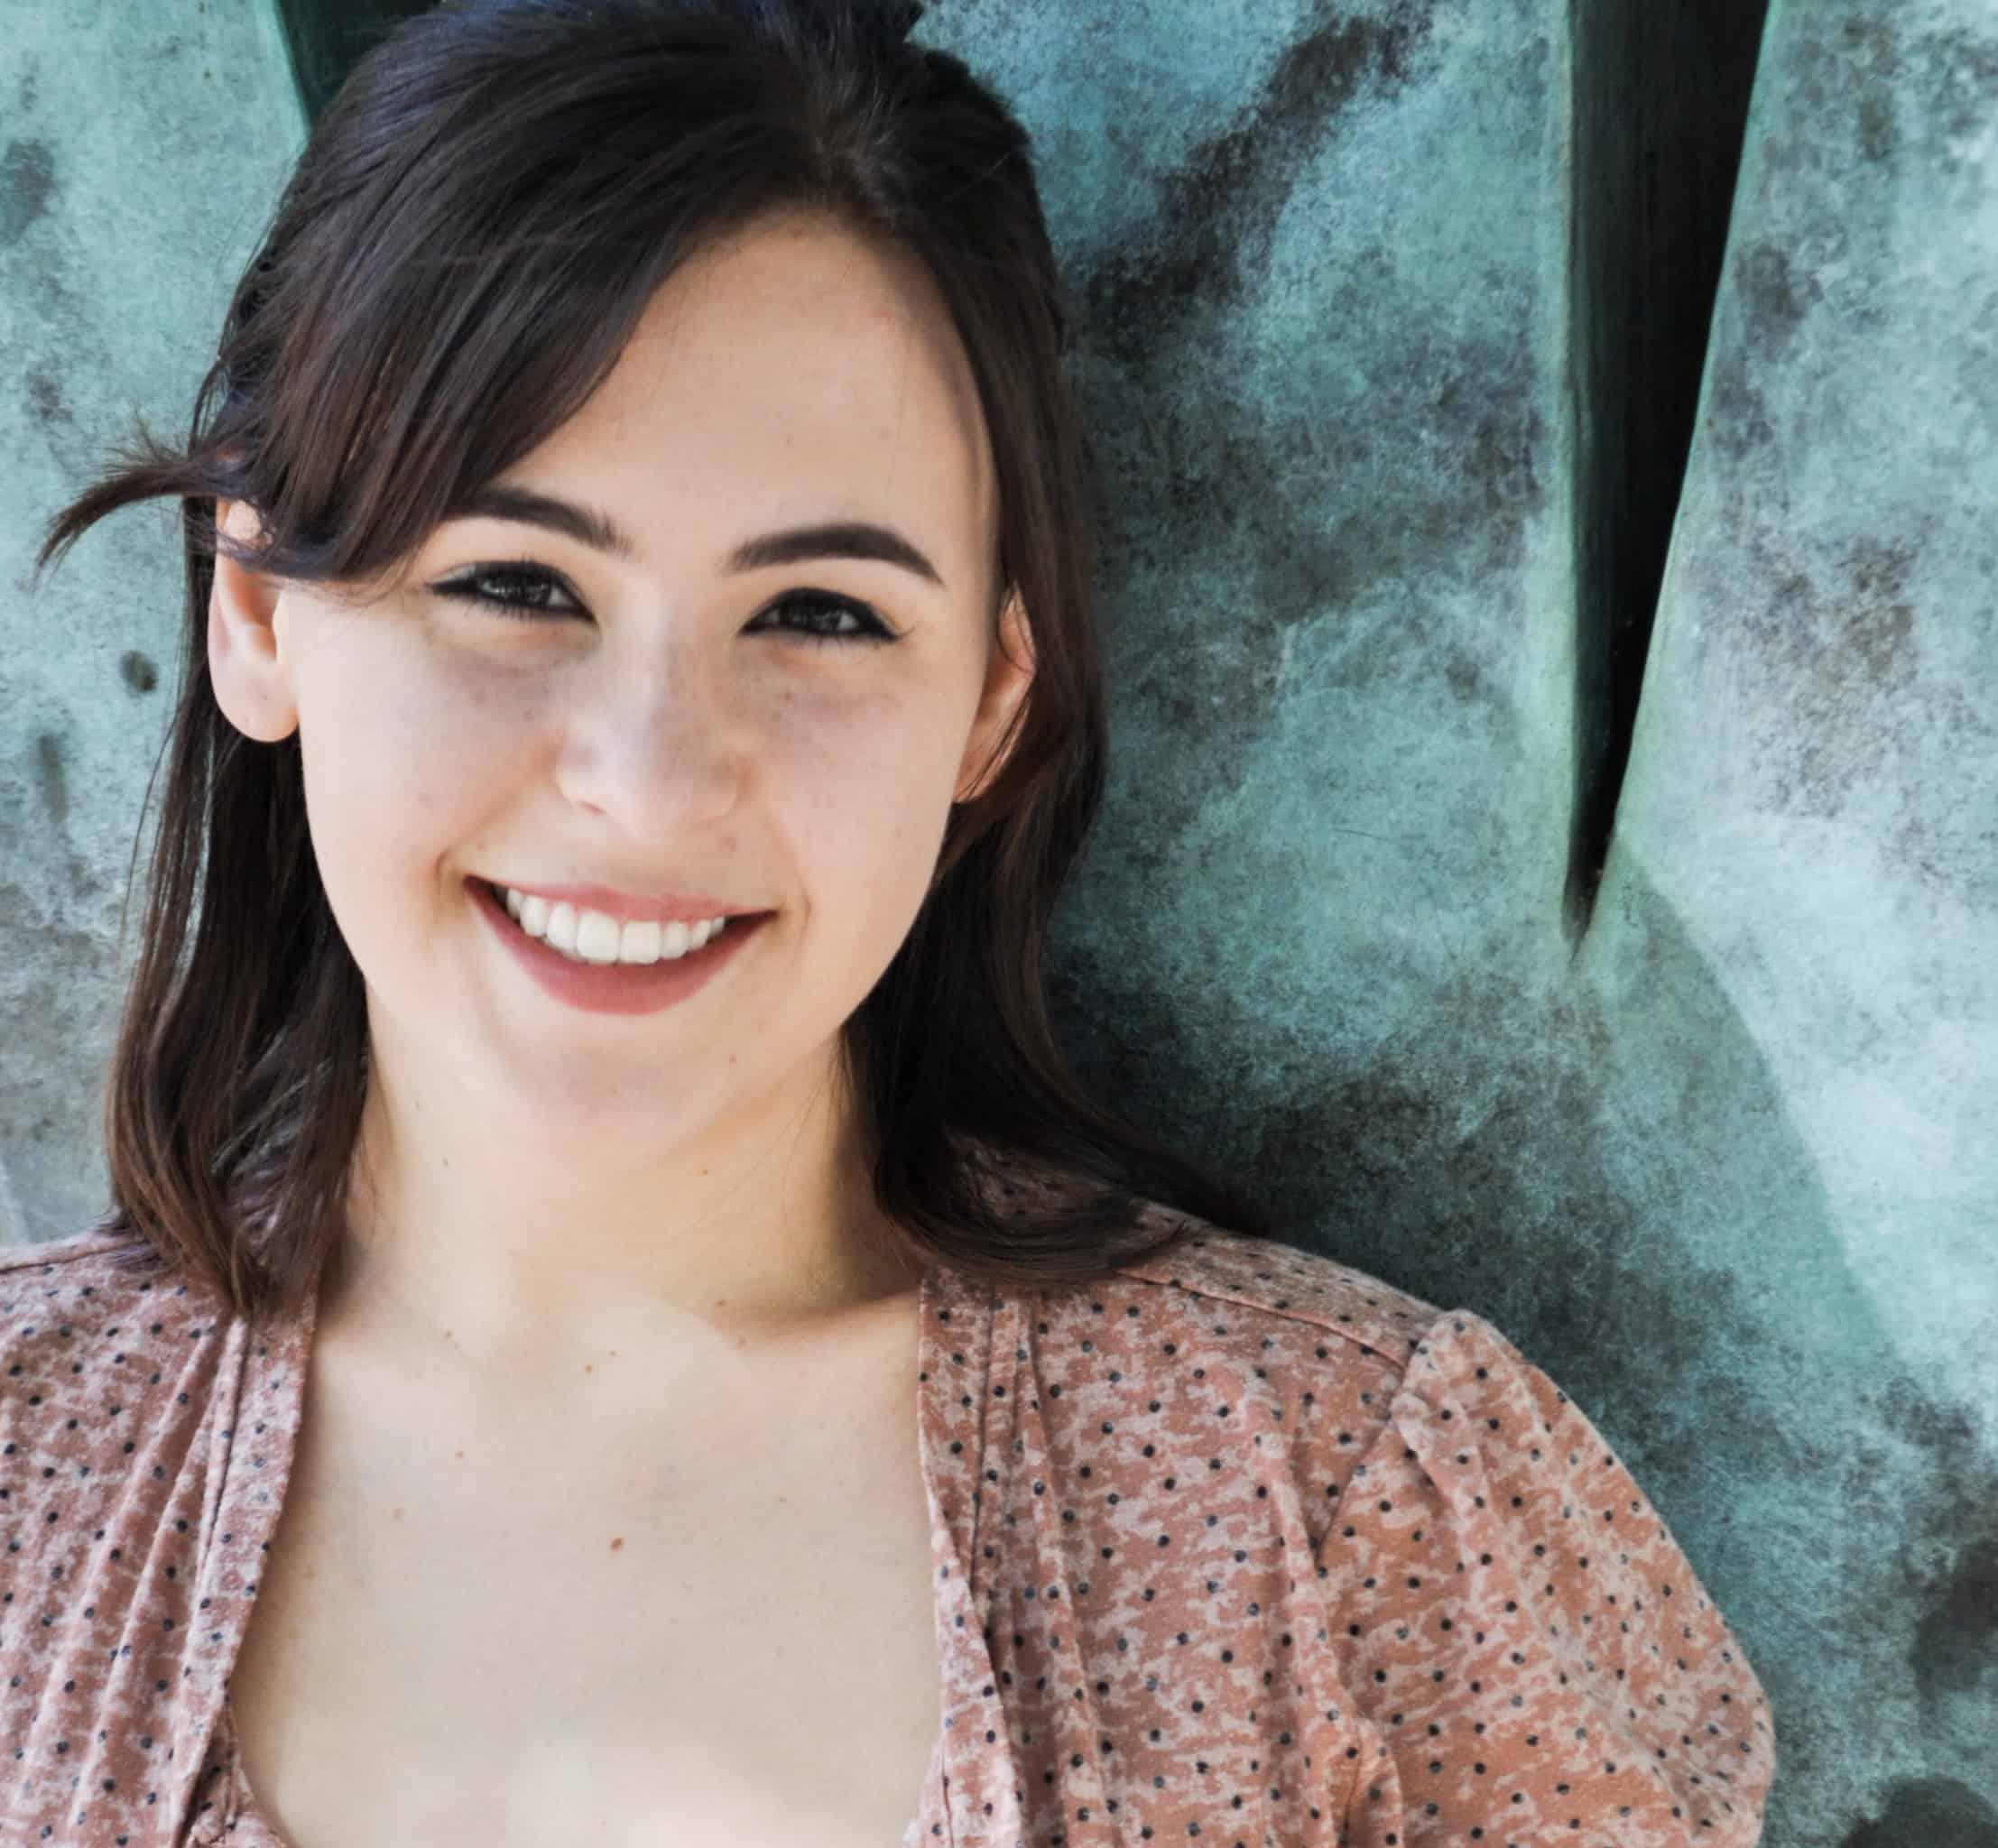 Amber Rudnick